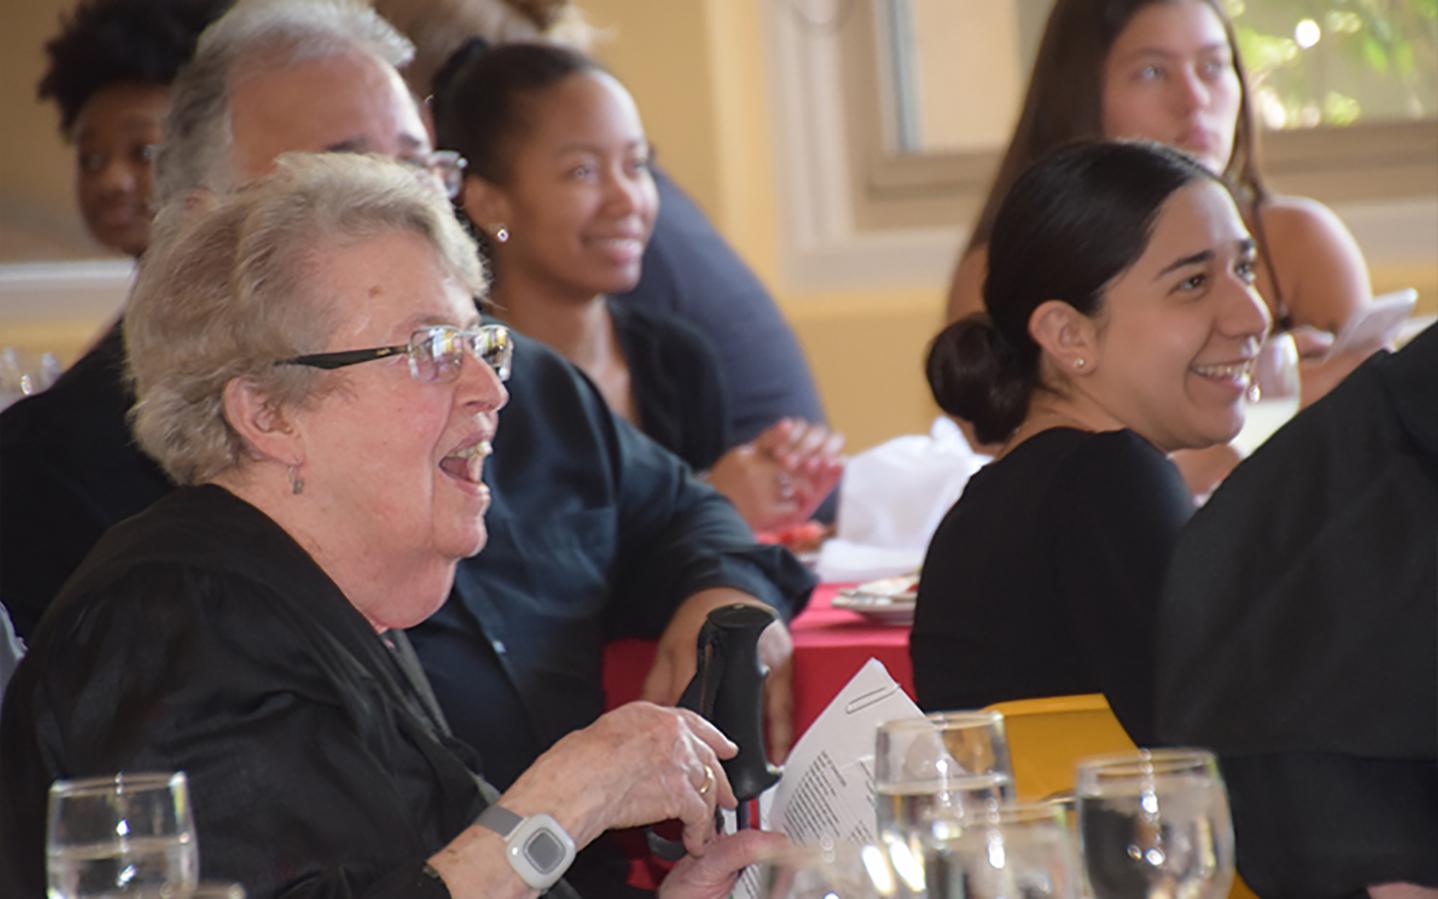 Holy Names University community members celebrating Founders' Day 2019